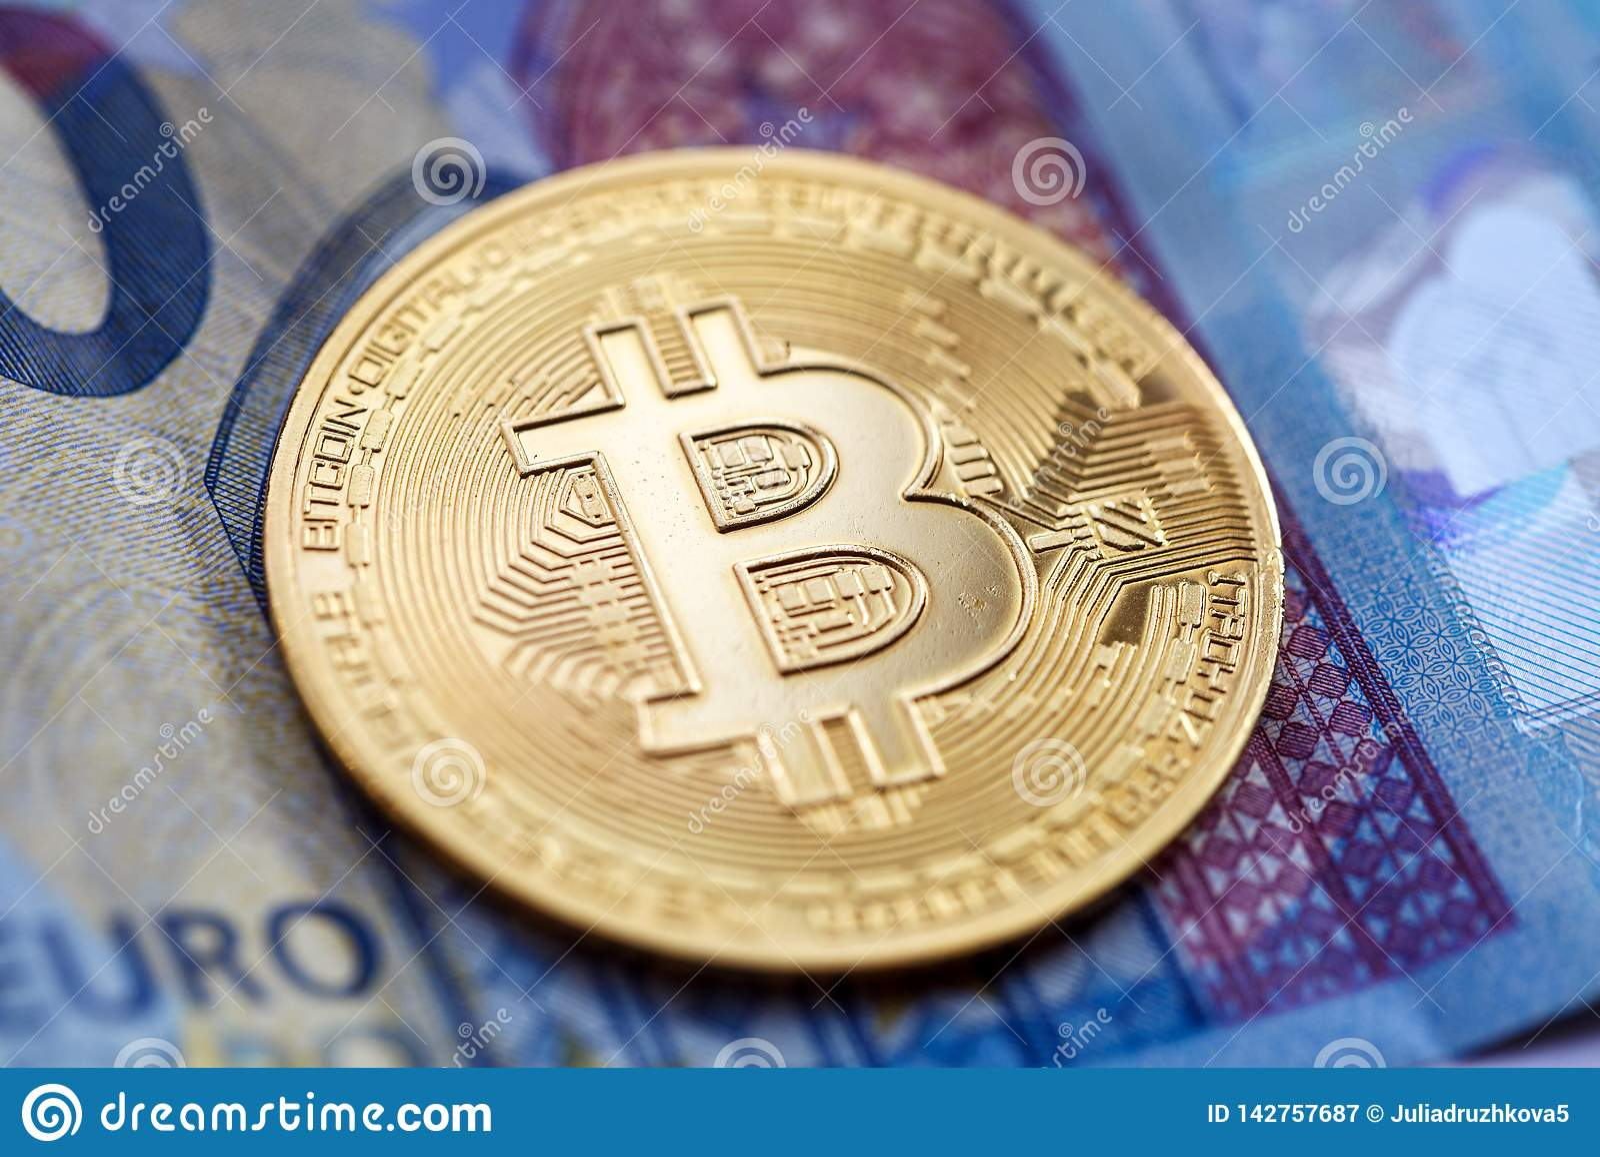 Cryptocurrency Bitcoin, золотая монета, лежит на счете 20-евро